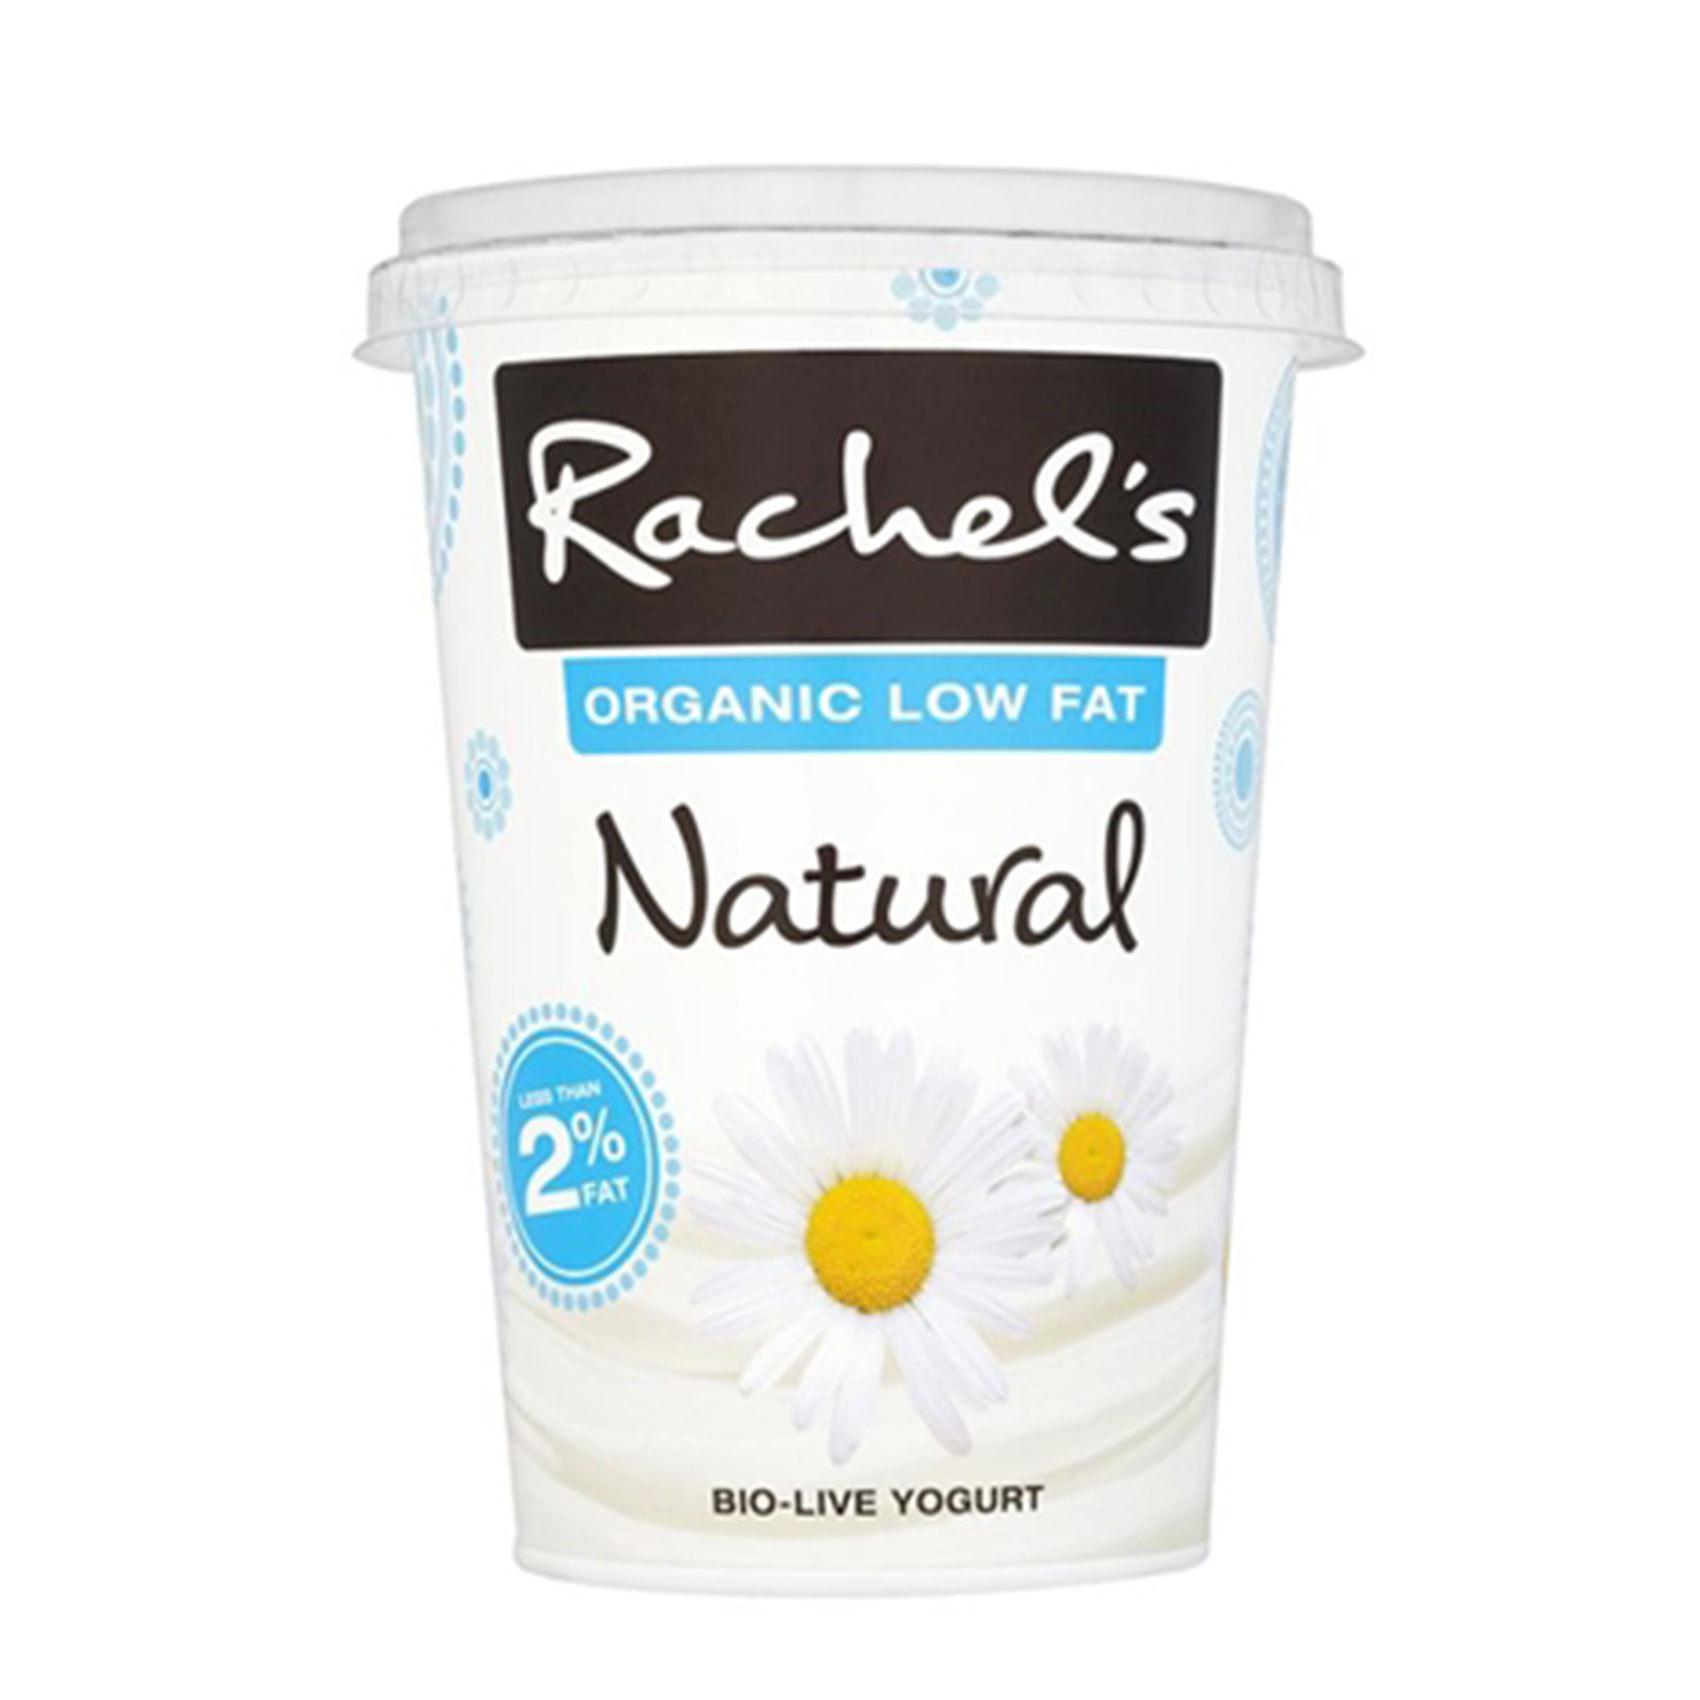 RACHEL'S O LOW FAT PLAIN YOG 450G